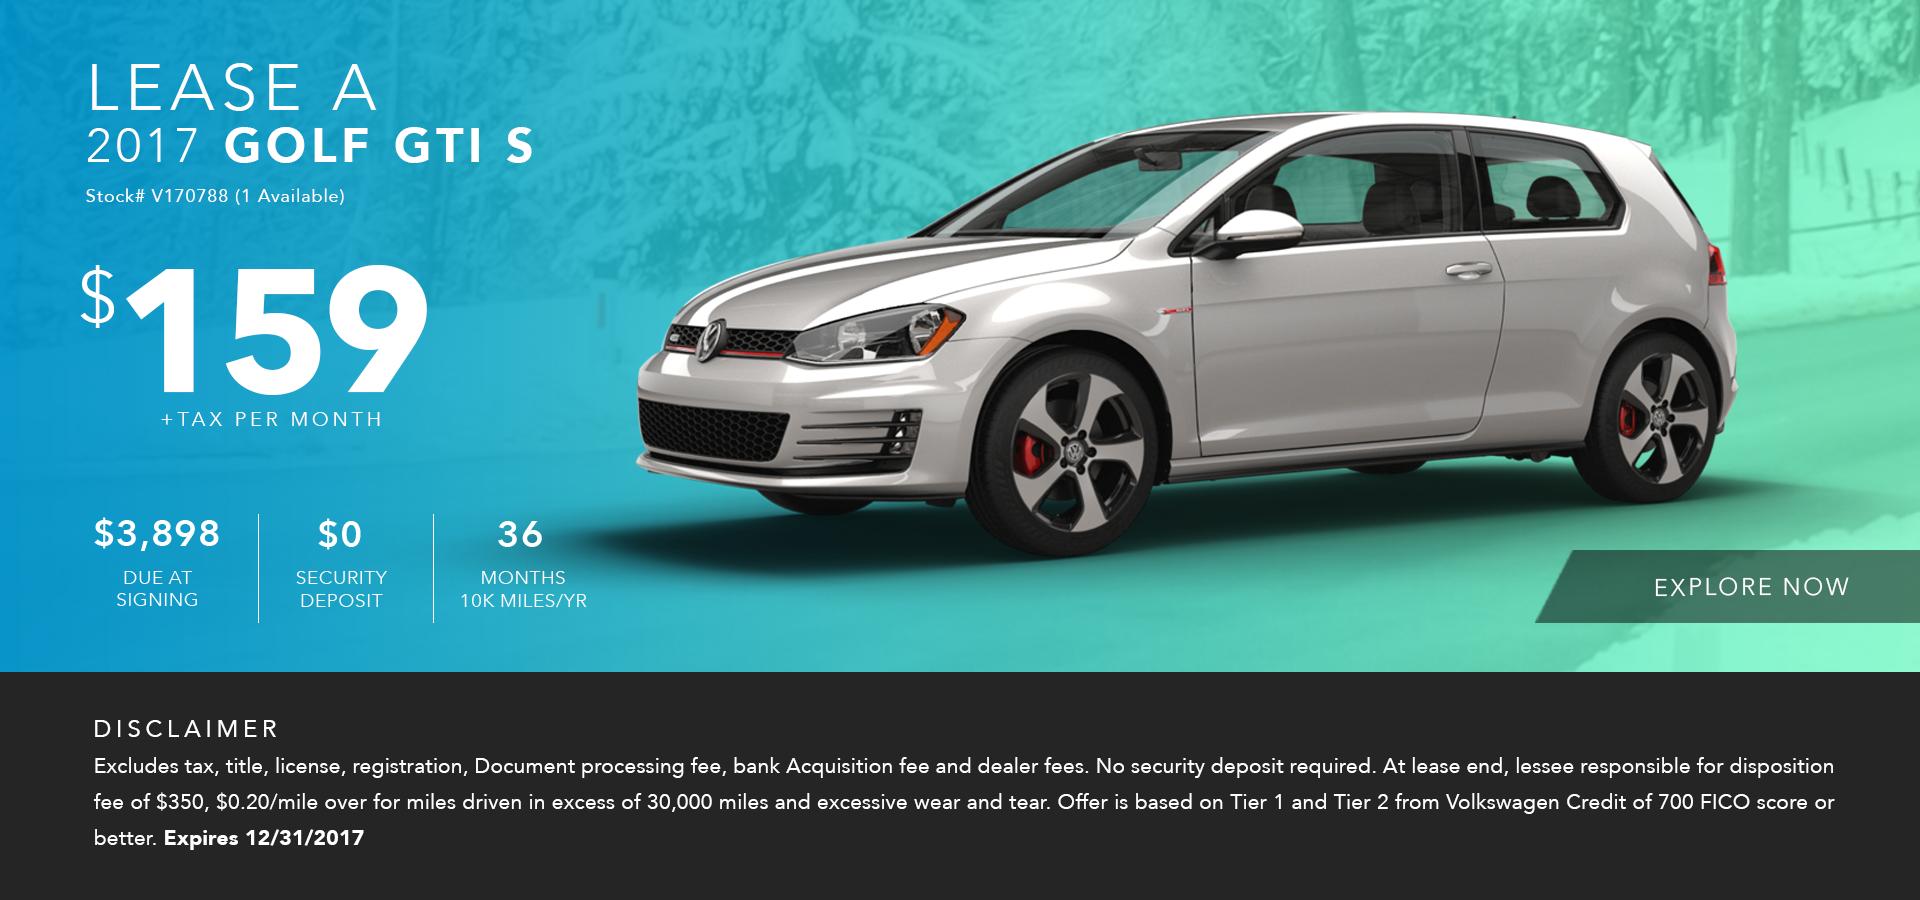 Volkswagen Service Center Locator Cars Inspiration Gallery